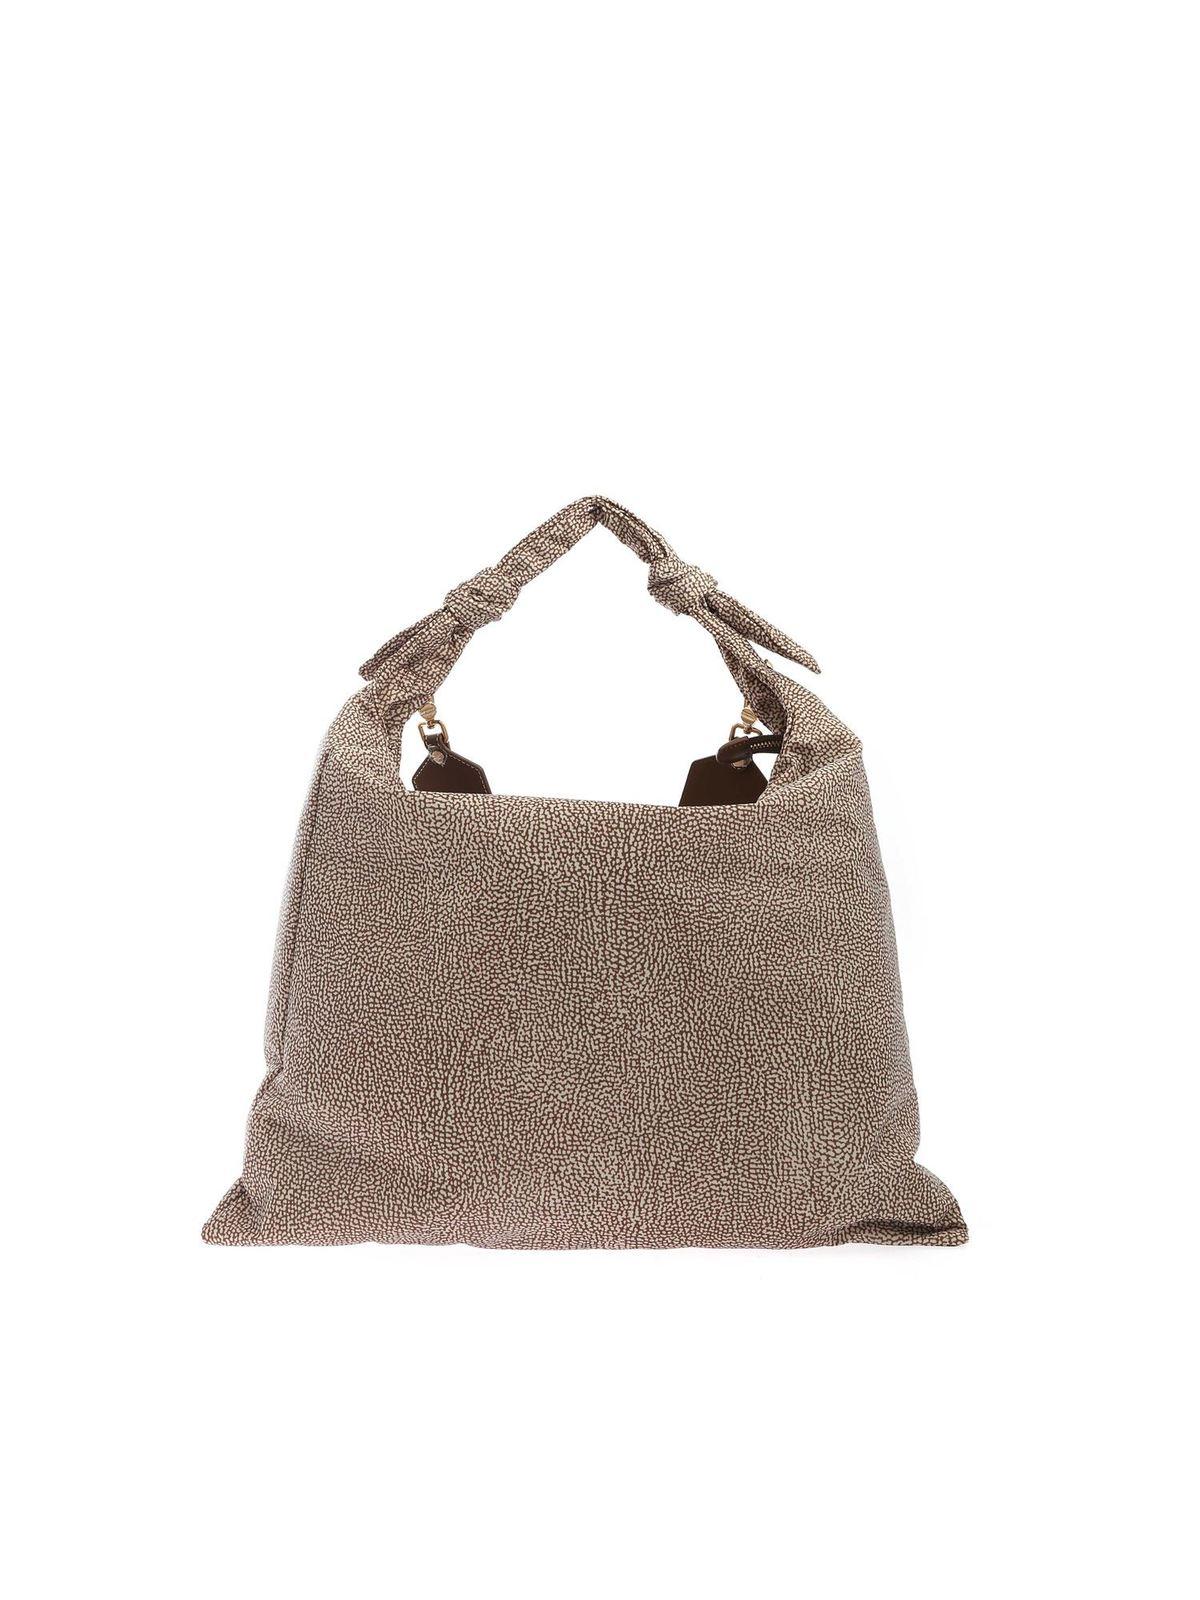 Borbonese Leathers PRINTED SHOULDER BAG IN BEIGE AND BROWN